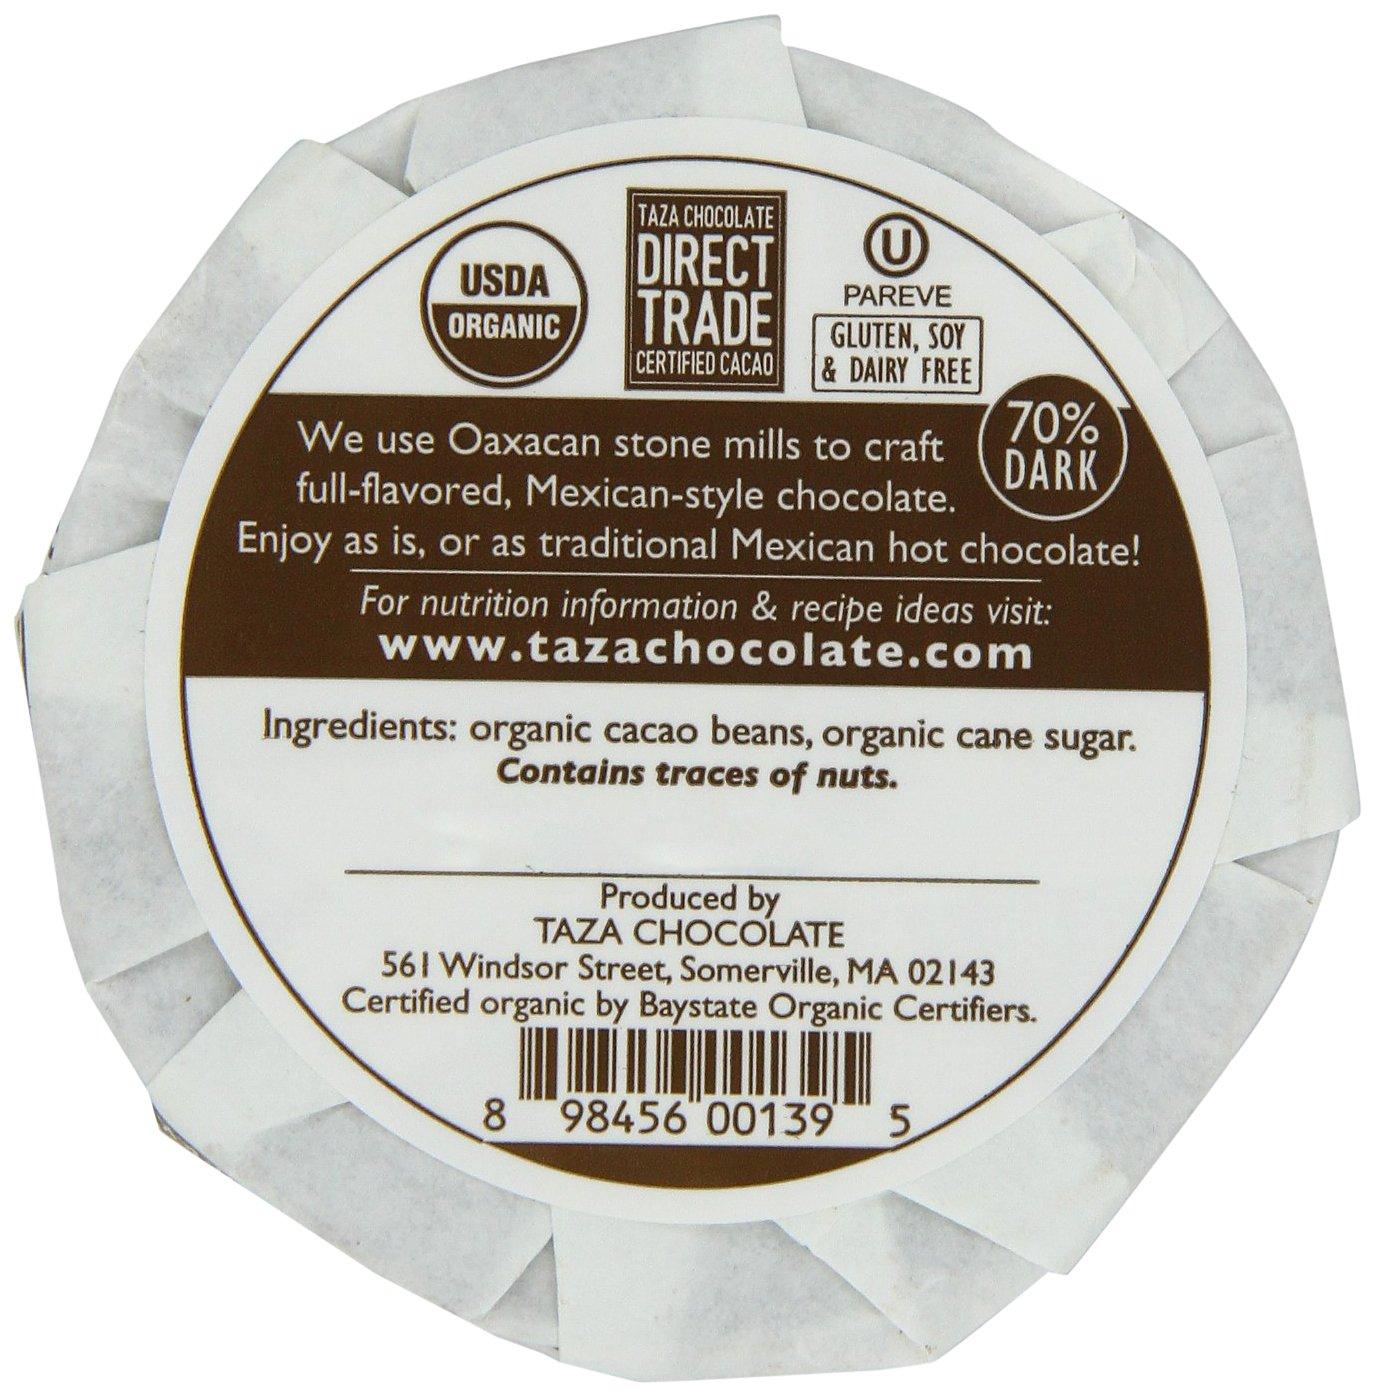 Amazon.com : Taza Chocolate Mexicano Chocolate Disc, Cacao Puro ...